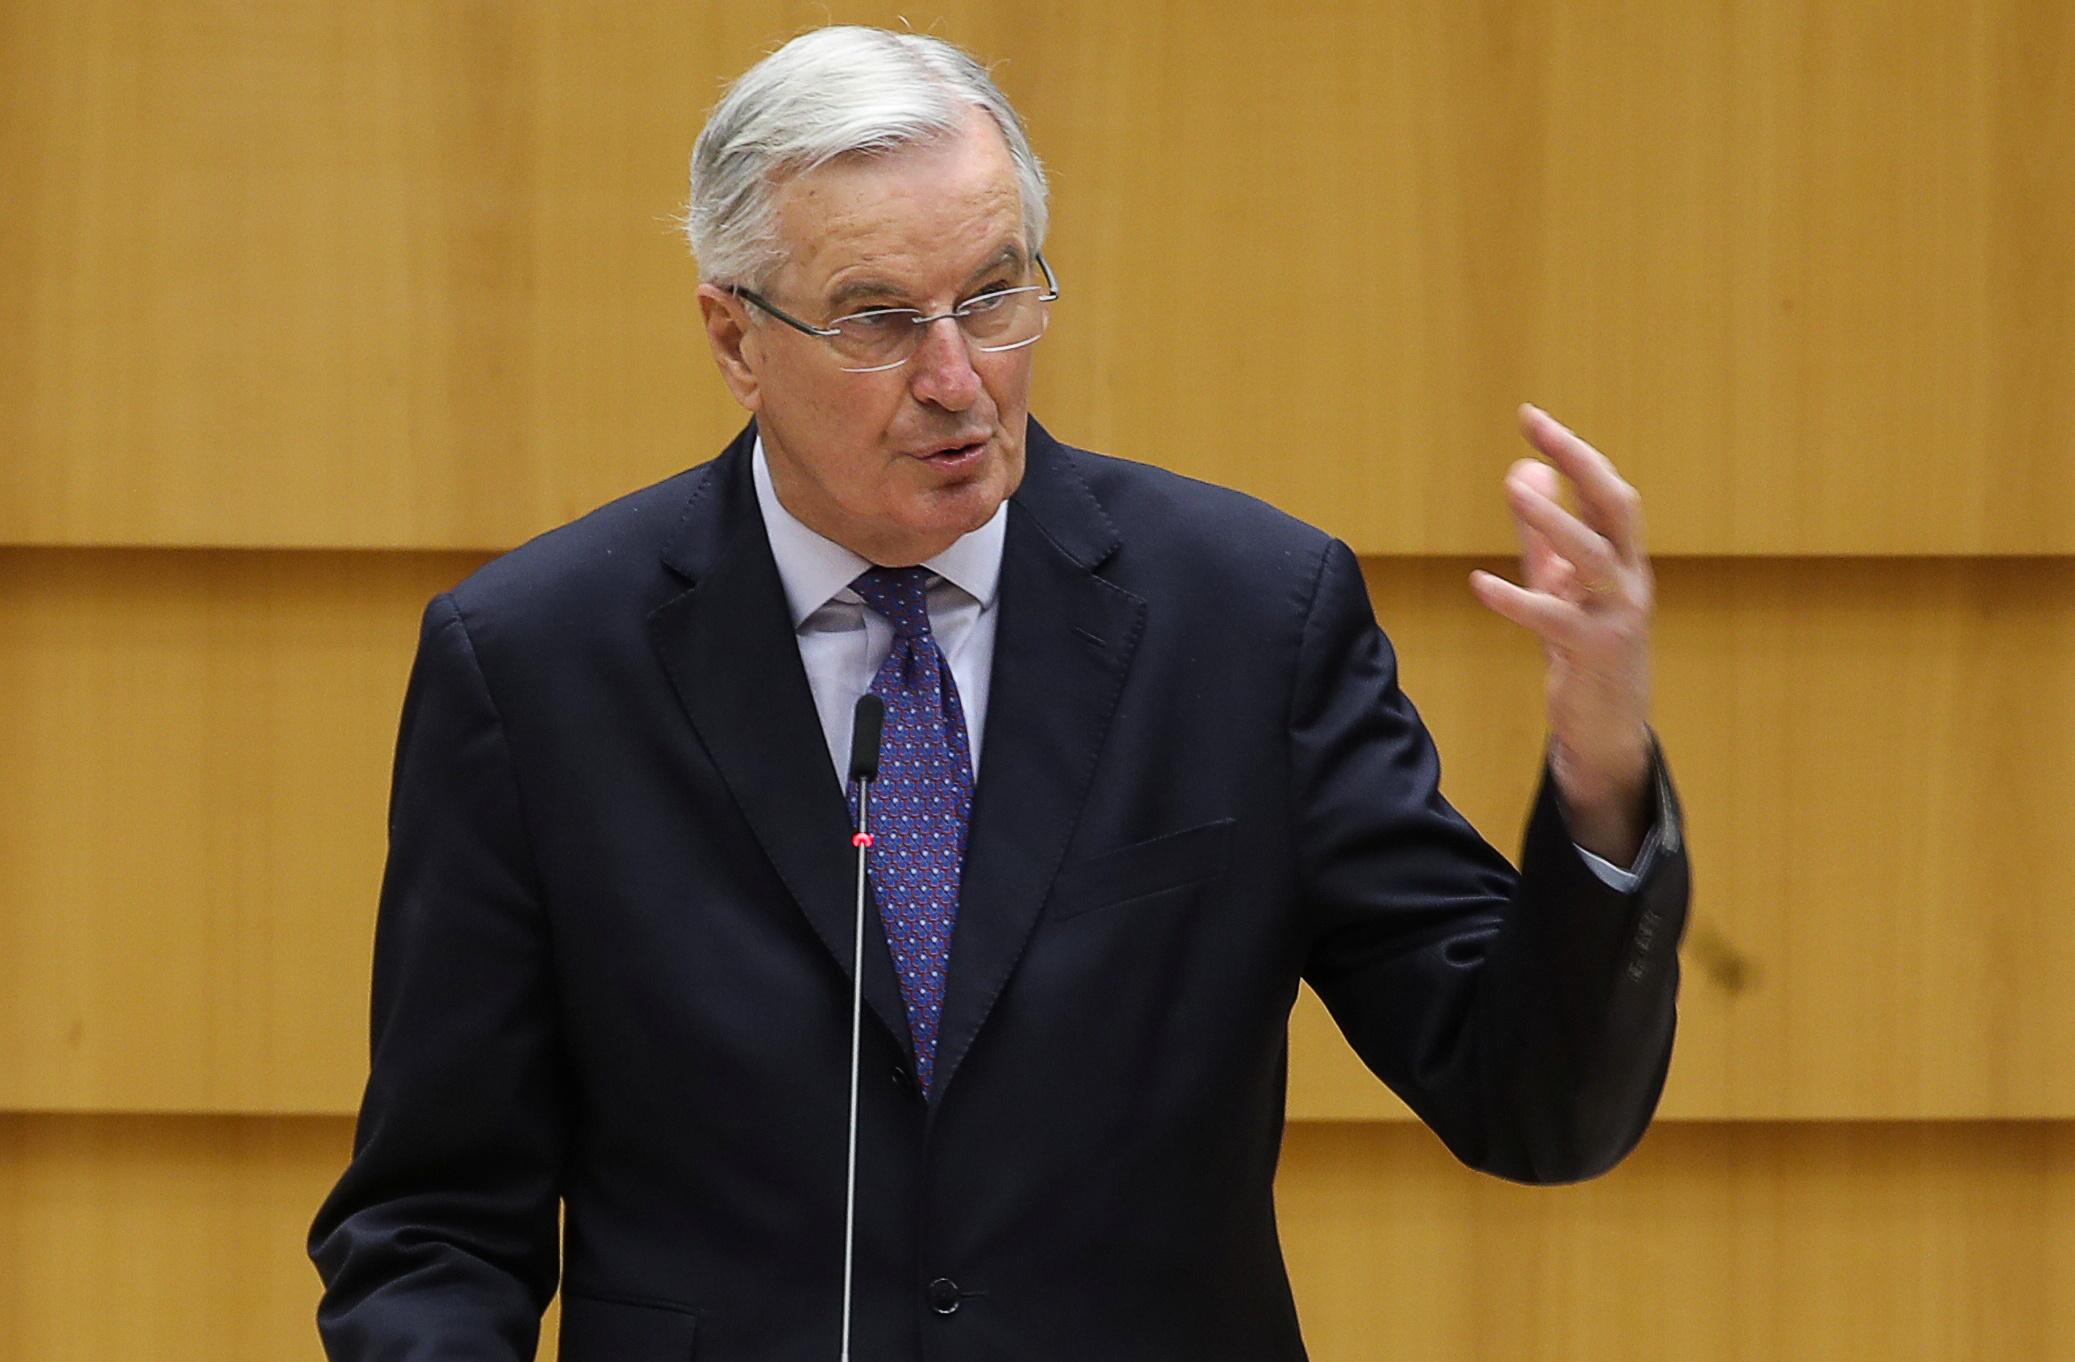 EU chief Brexit negotiator Michel Barnier gestures as he addresses the European Parliament in Brussels, Belgium, December 18, 2020. REUTERS/Yves Herman